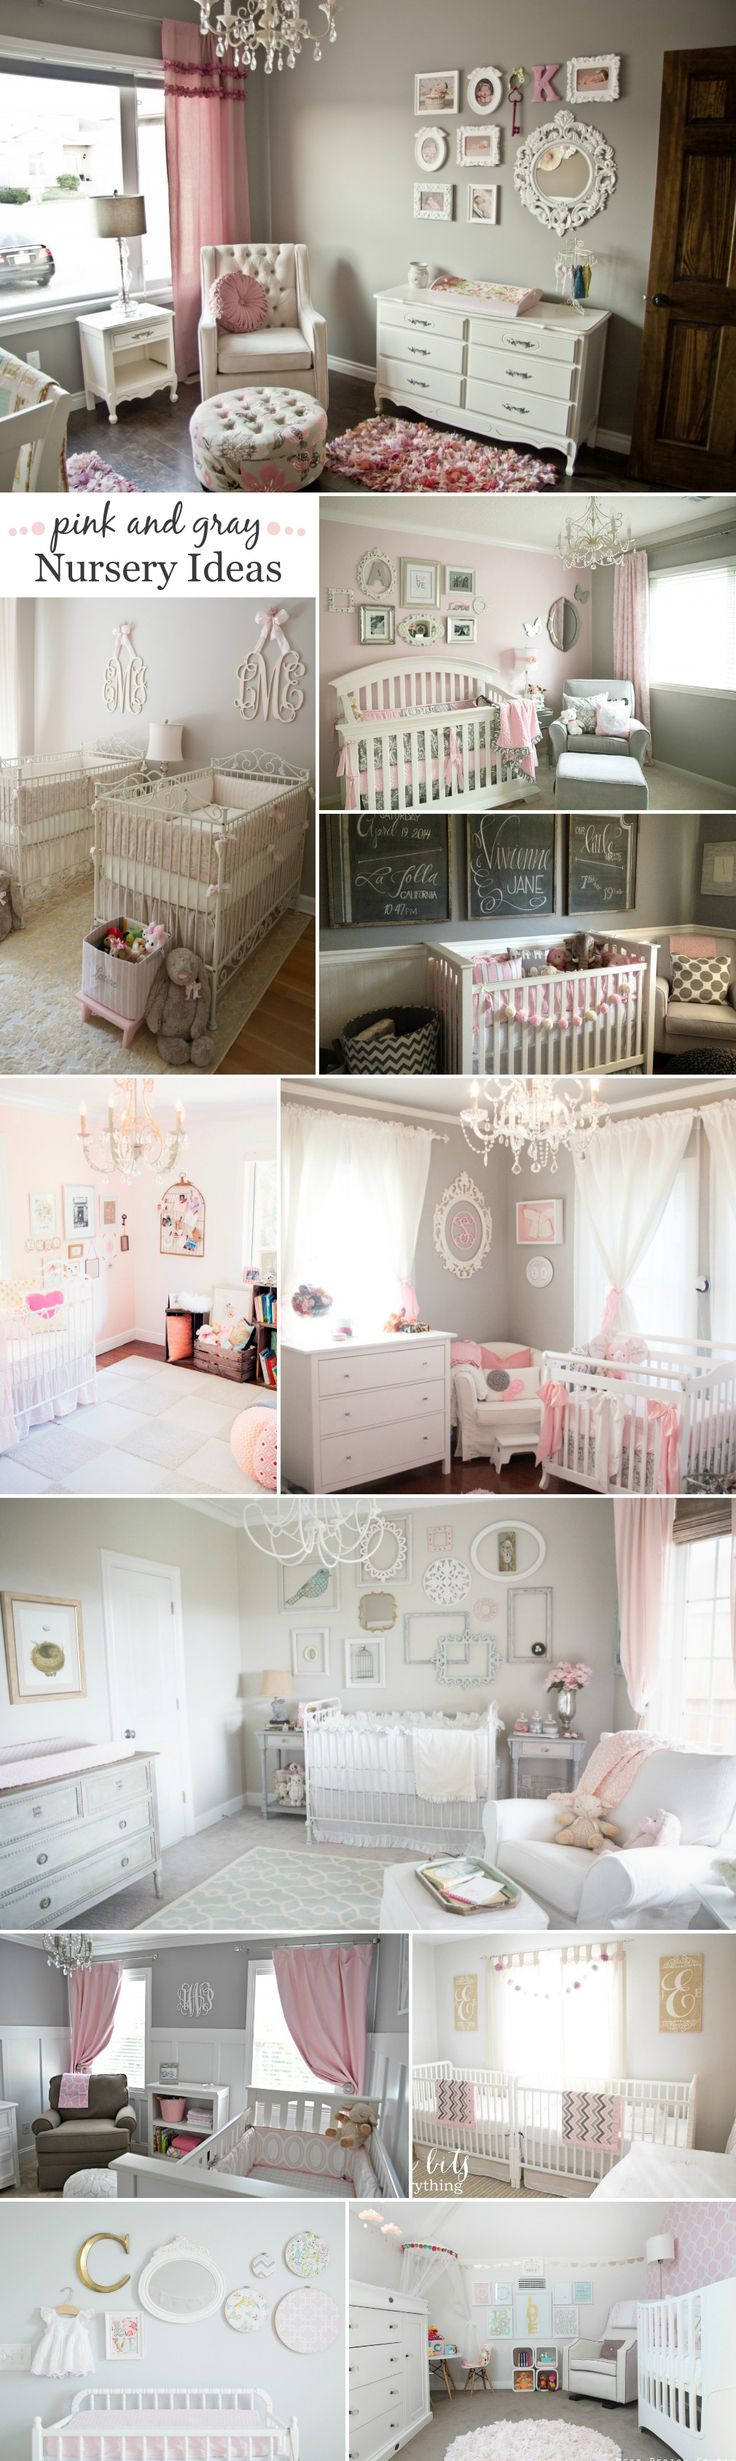 Pink and Gray Nursery Ideas - 11 looks we love! | ProjectNursery.com